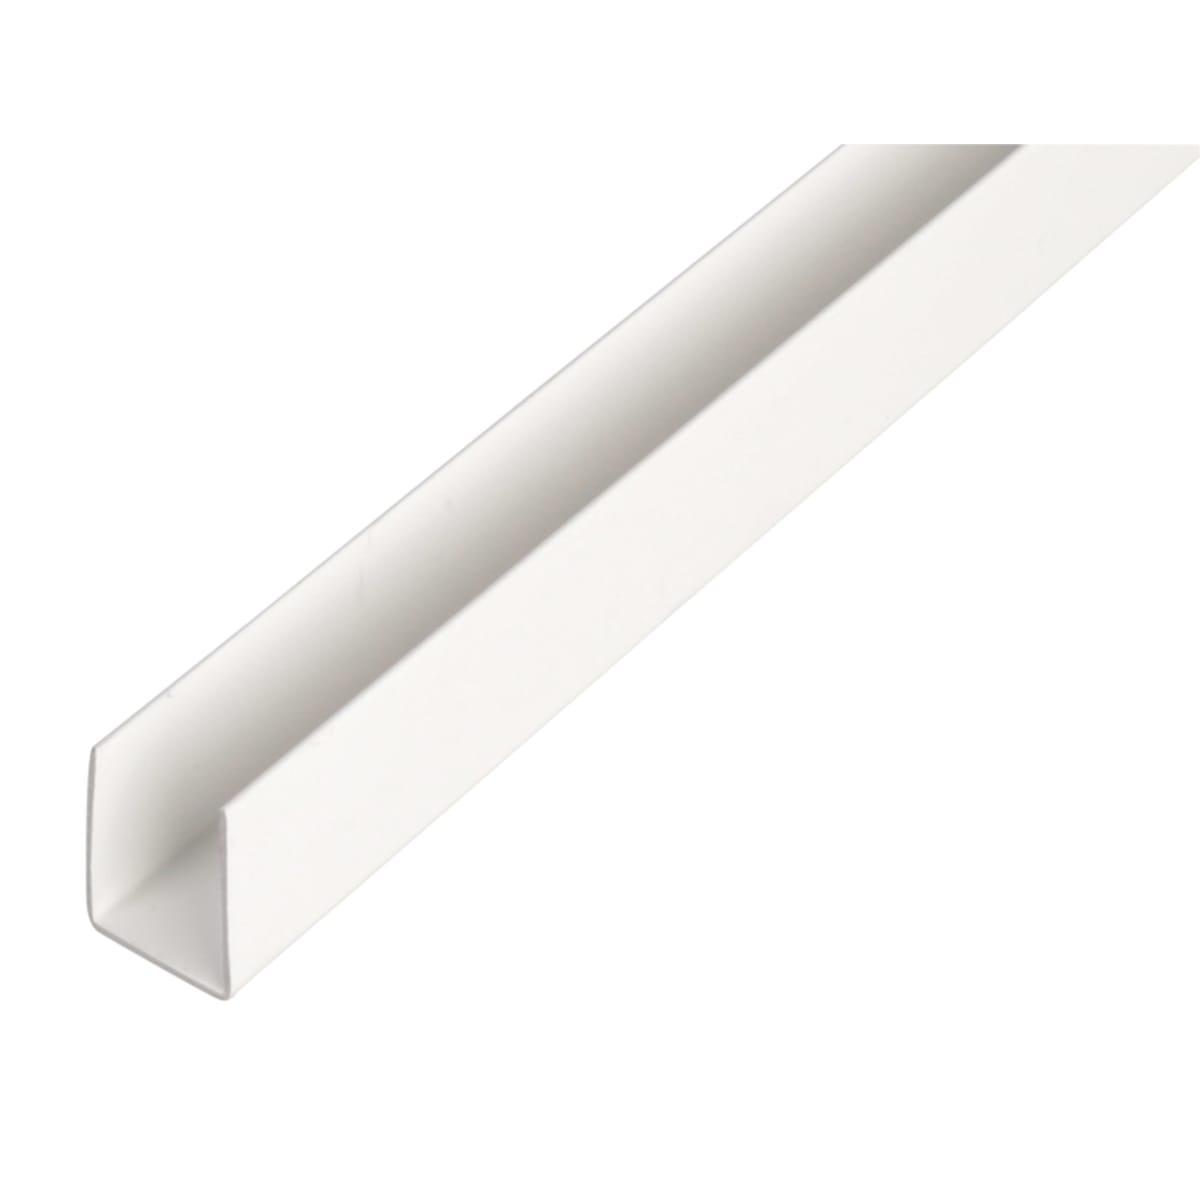 U-Профиль ПВХ 21x20x1x1000 мм, цвет белый